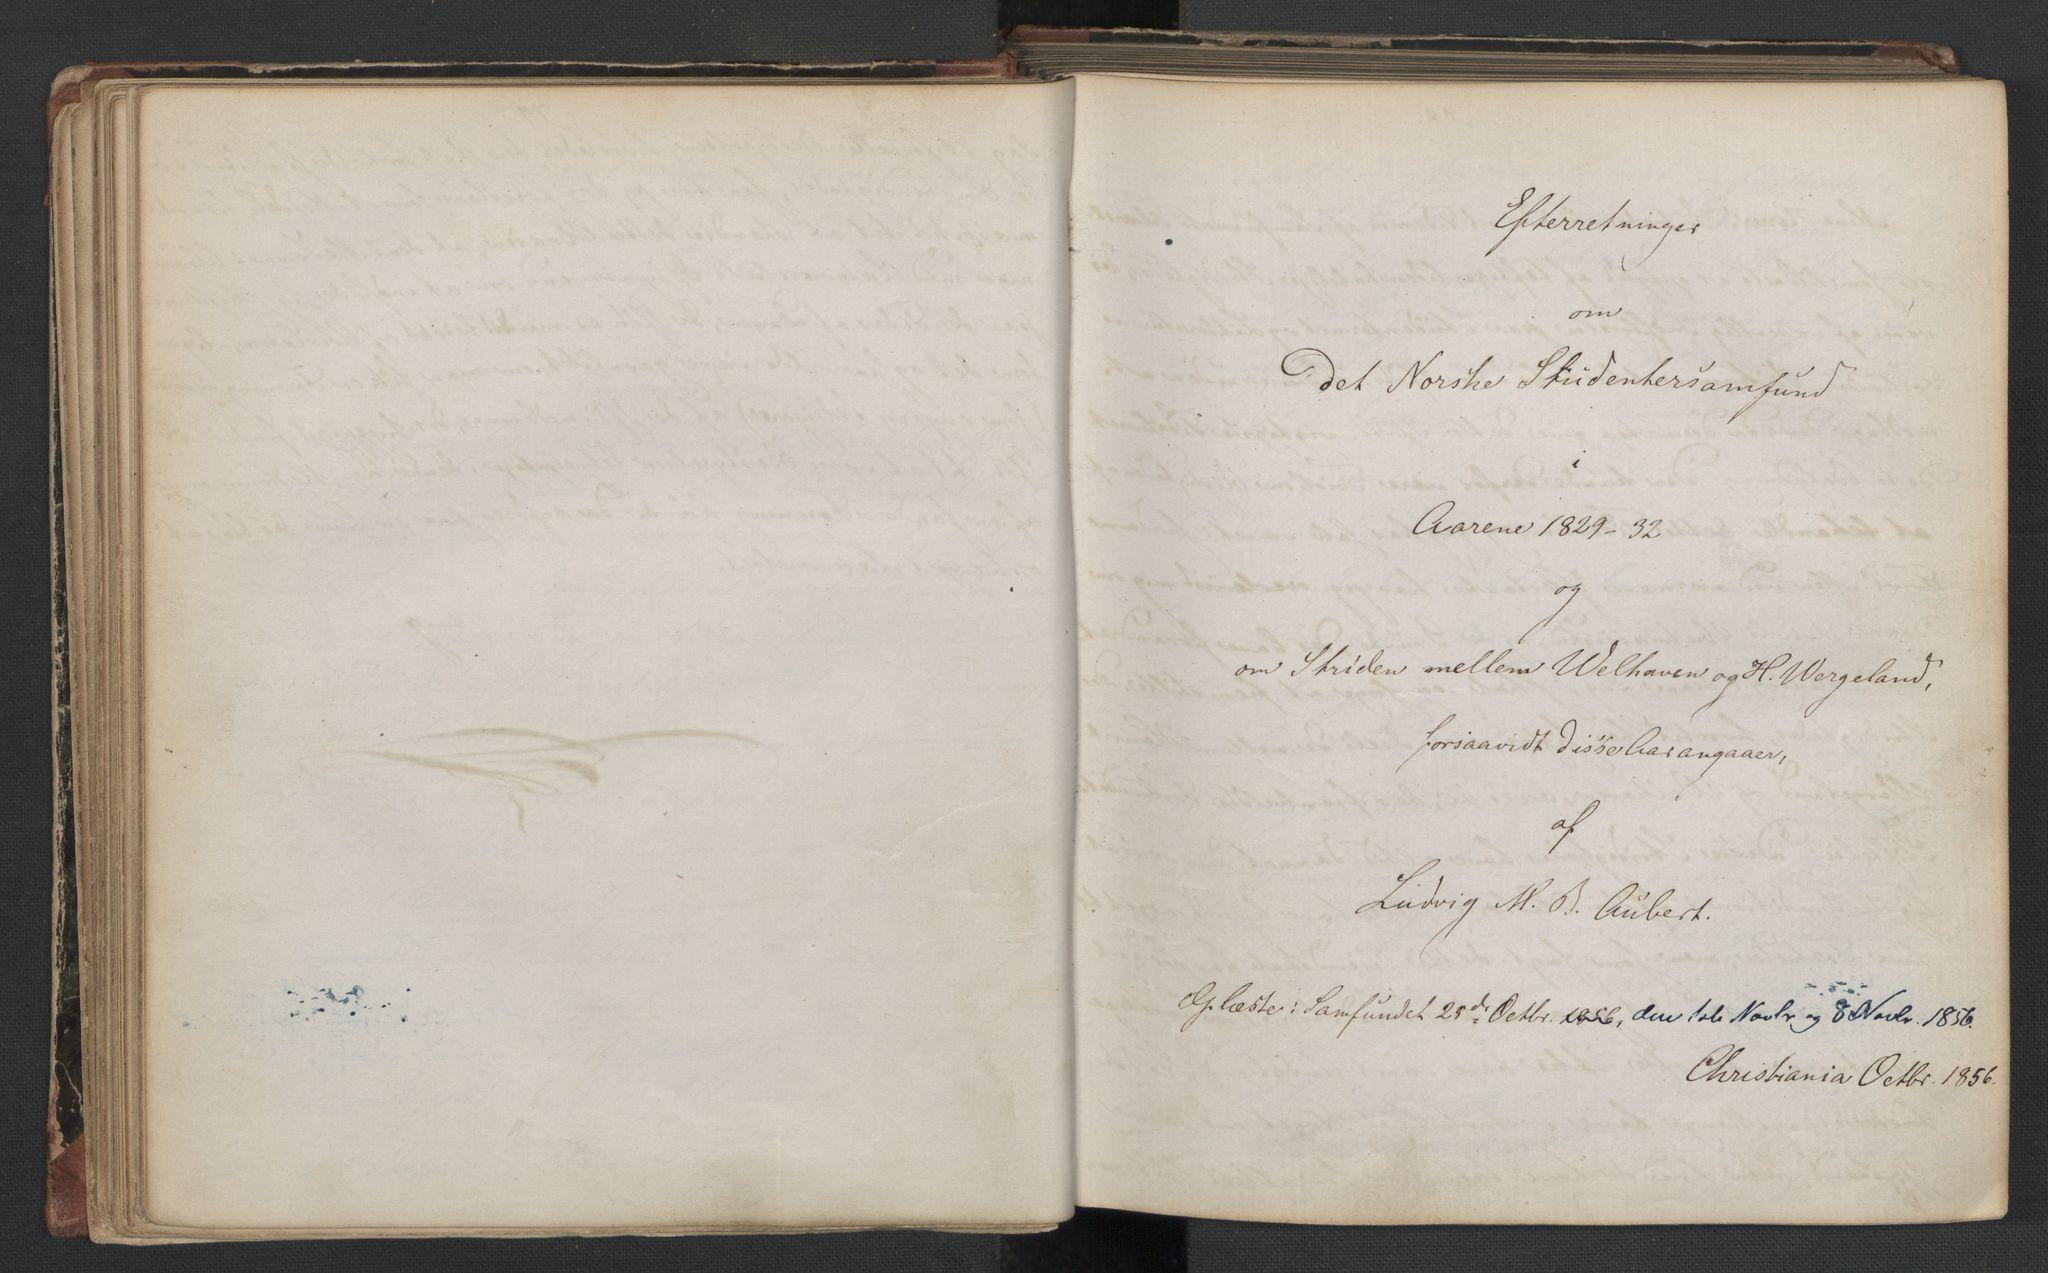 RA, Det Norske Studentersamfund, X/Xa/L0006, 1856-1857, s. 44